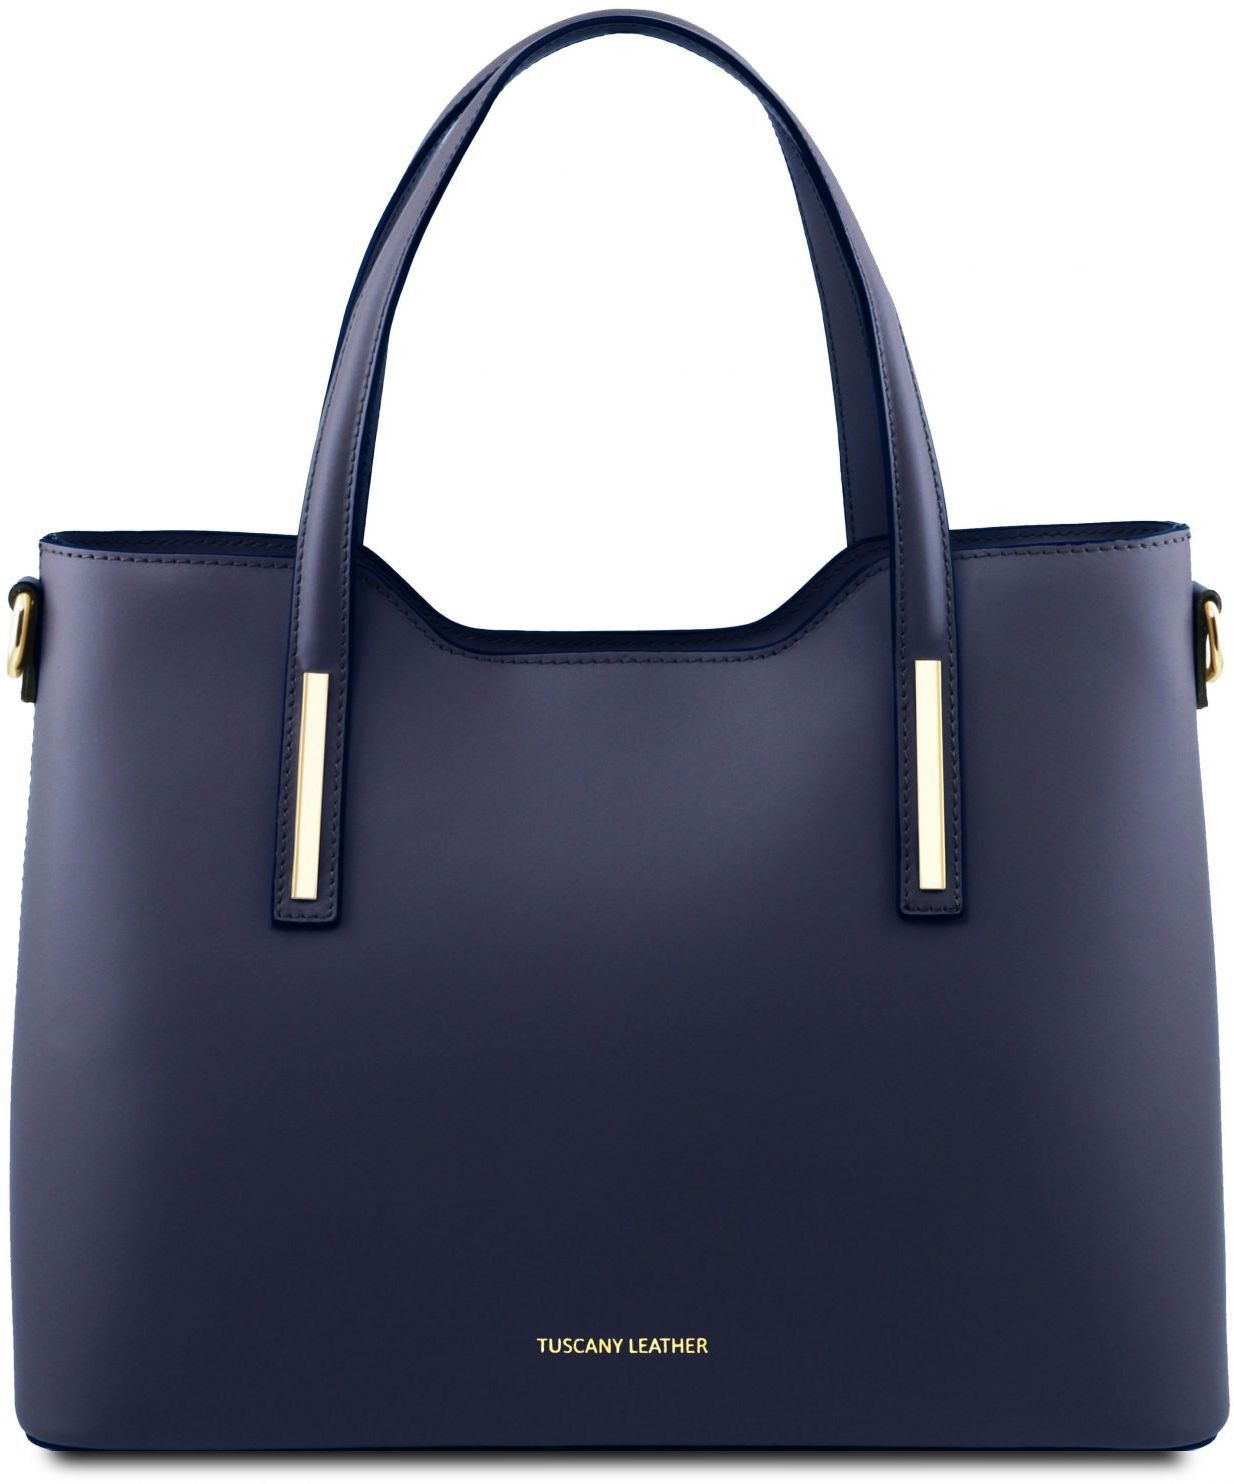 ca95e3b199 Γυναικεία Τσάντα Δερμάτινη Olimpia Μπλε σκούρο Tuscany Leather